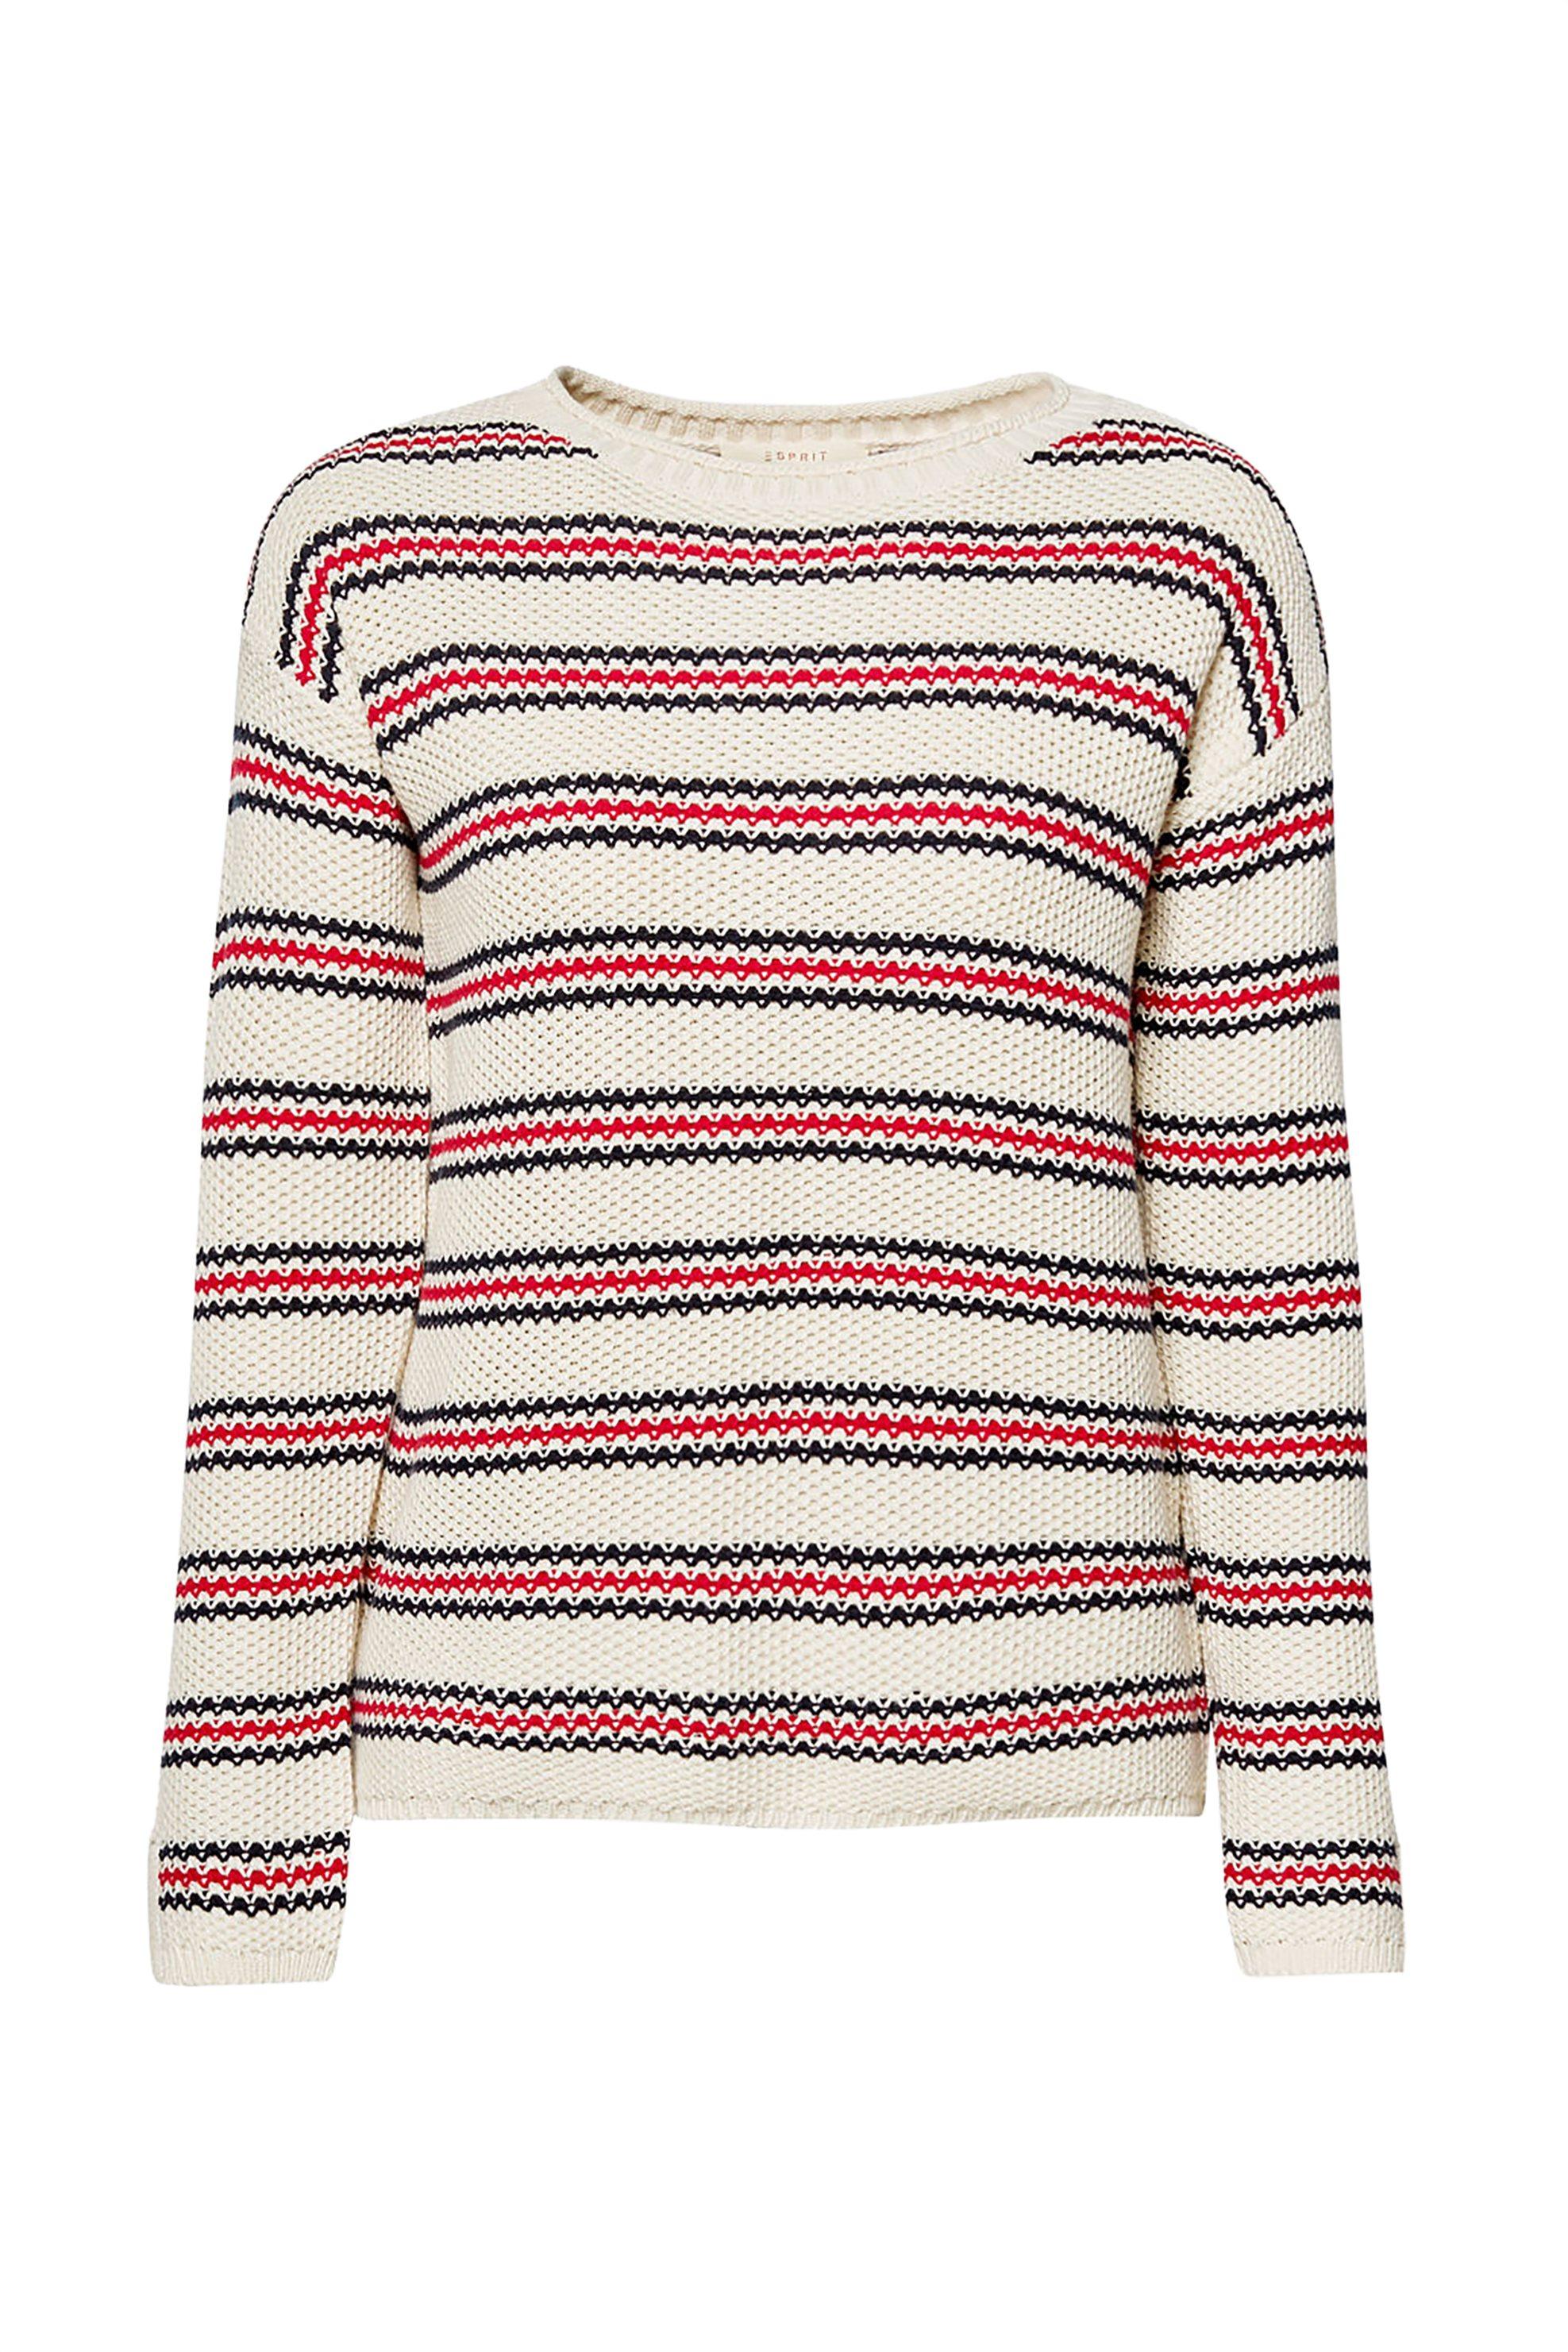 Esprit γυναικείο πλεκτό με ρίγες - 029EE1I006 - Εκρού γυναικα   ρουχα   πλεκτά   πουλόβερ